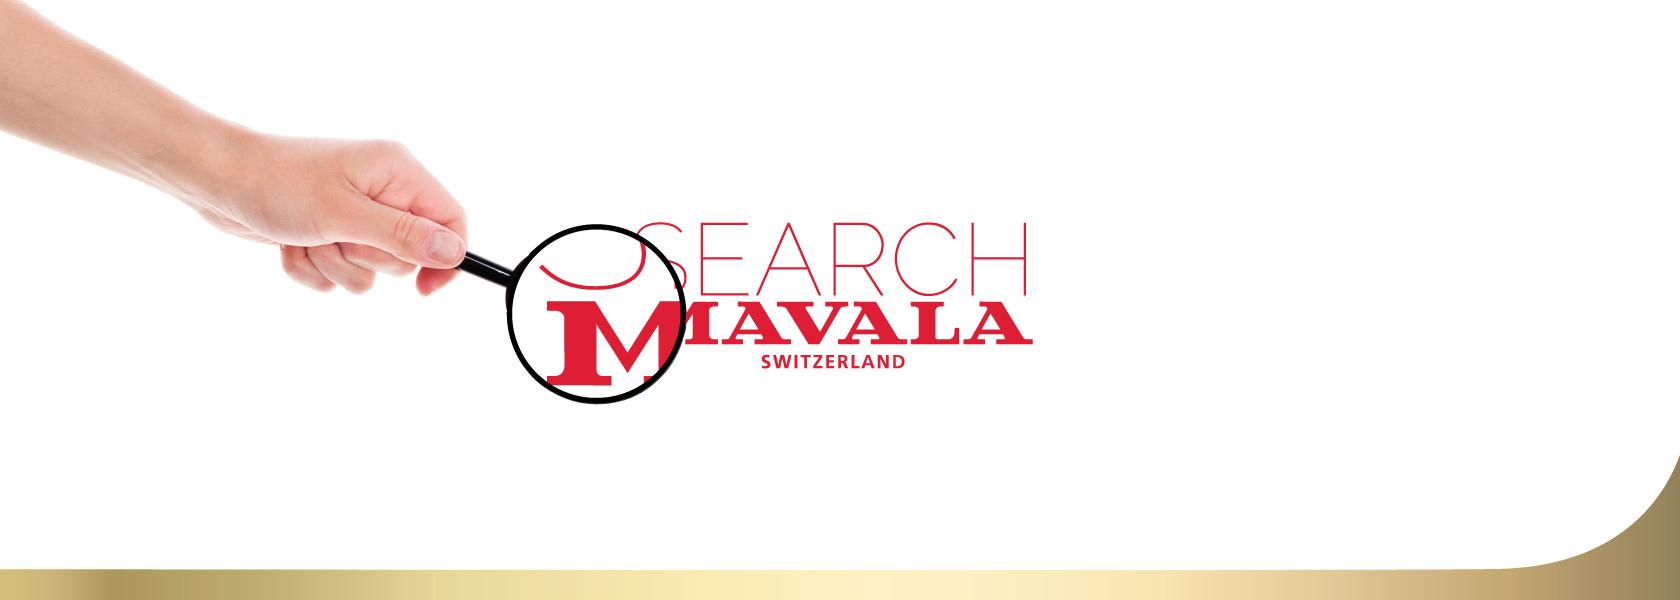 search mavala